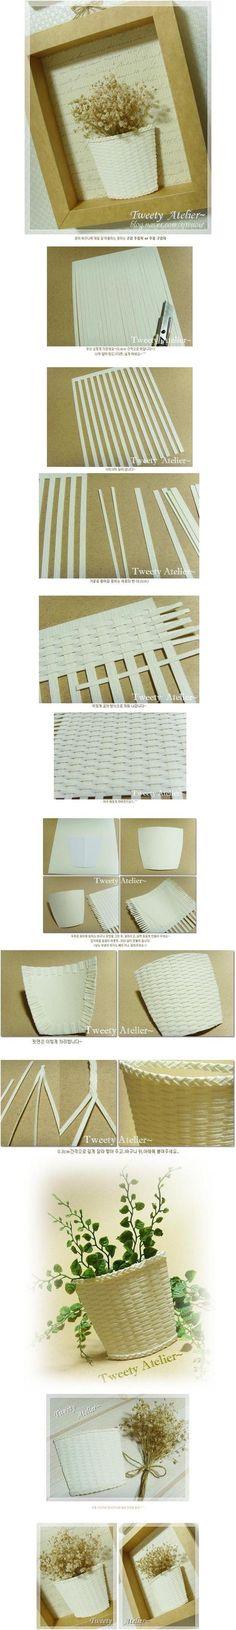 DIY Paper Pot Decoration DIY Paper Pot Decoration